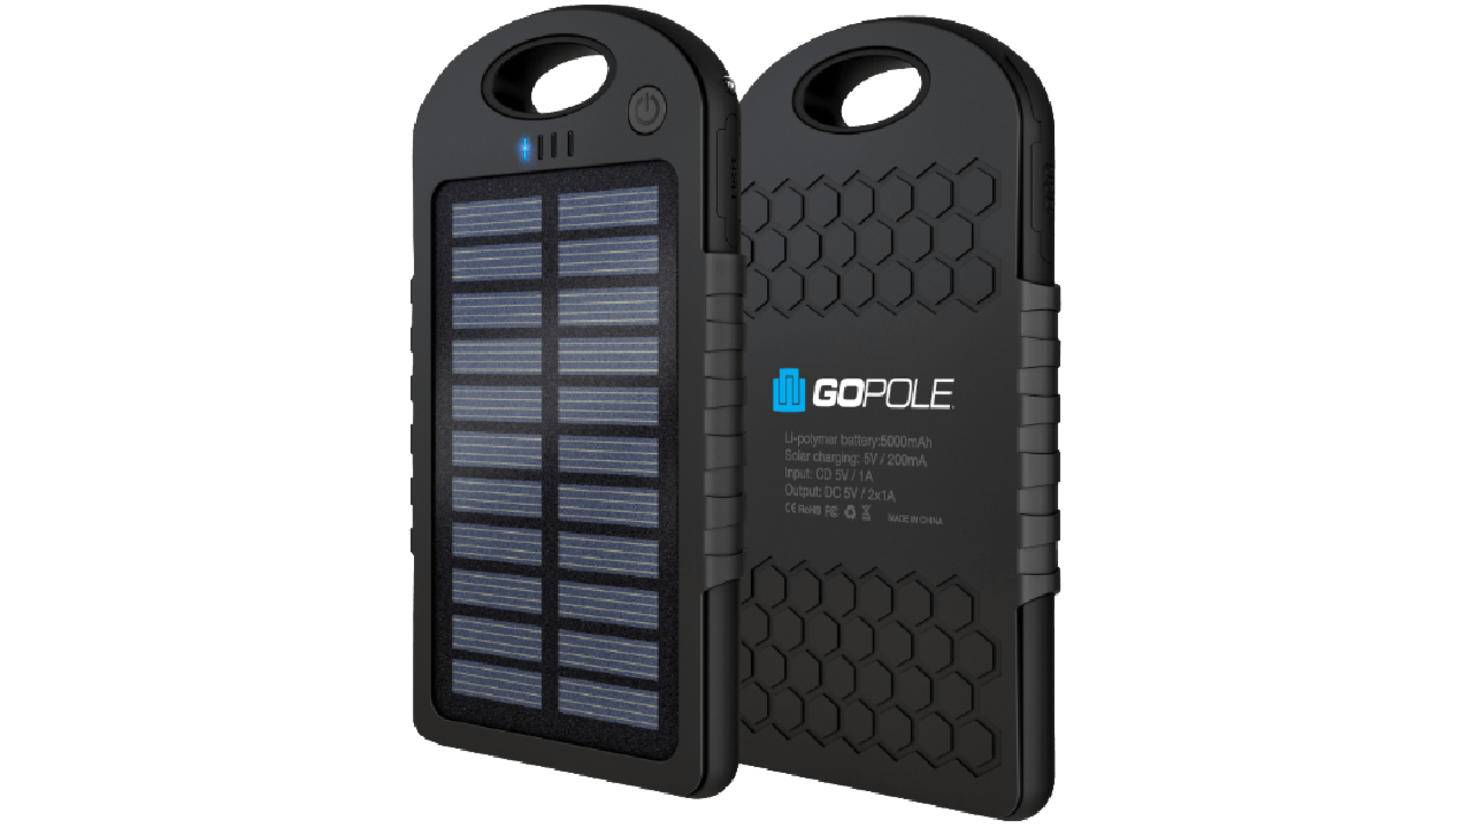 GoPole GPP-26